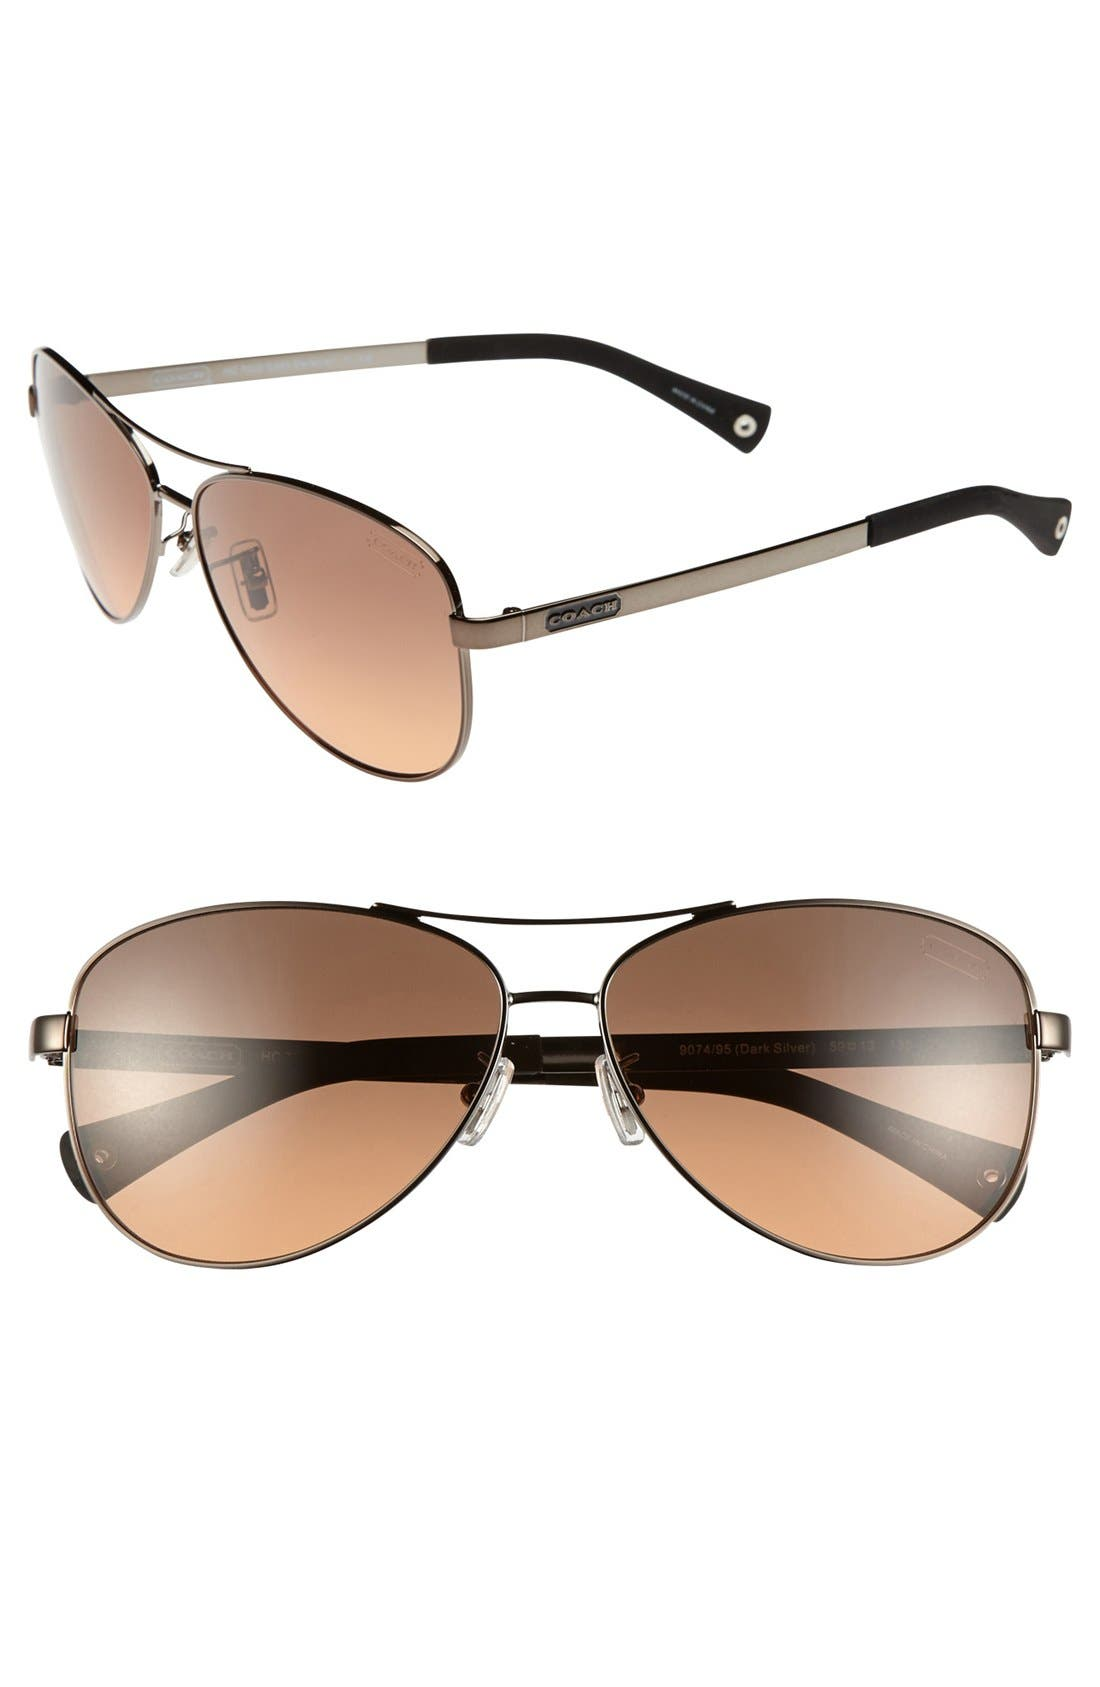 Alternate Image 1 Selected - COACH 59mm Aviator Sunglasses